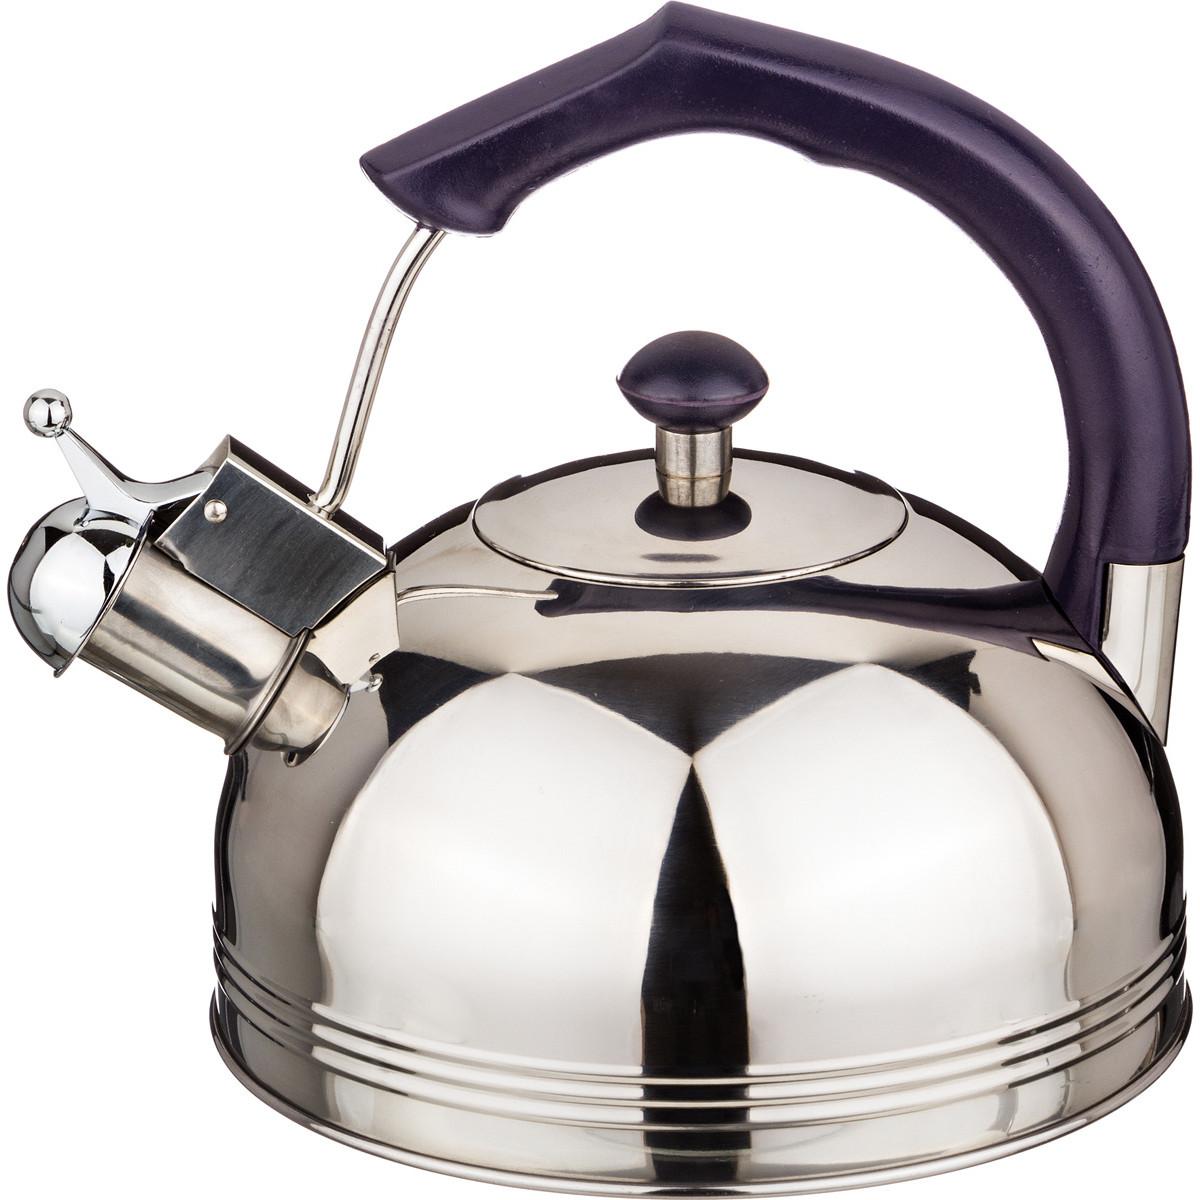 {} Agness Чайник со свистком Alyson  (2500 мл) чайник agness 3л нерж сталь со свистком